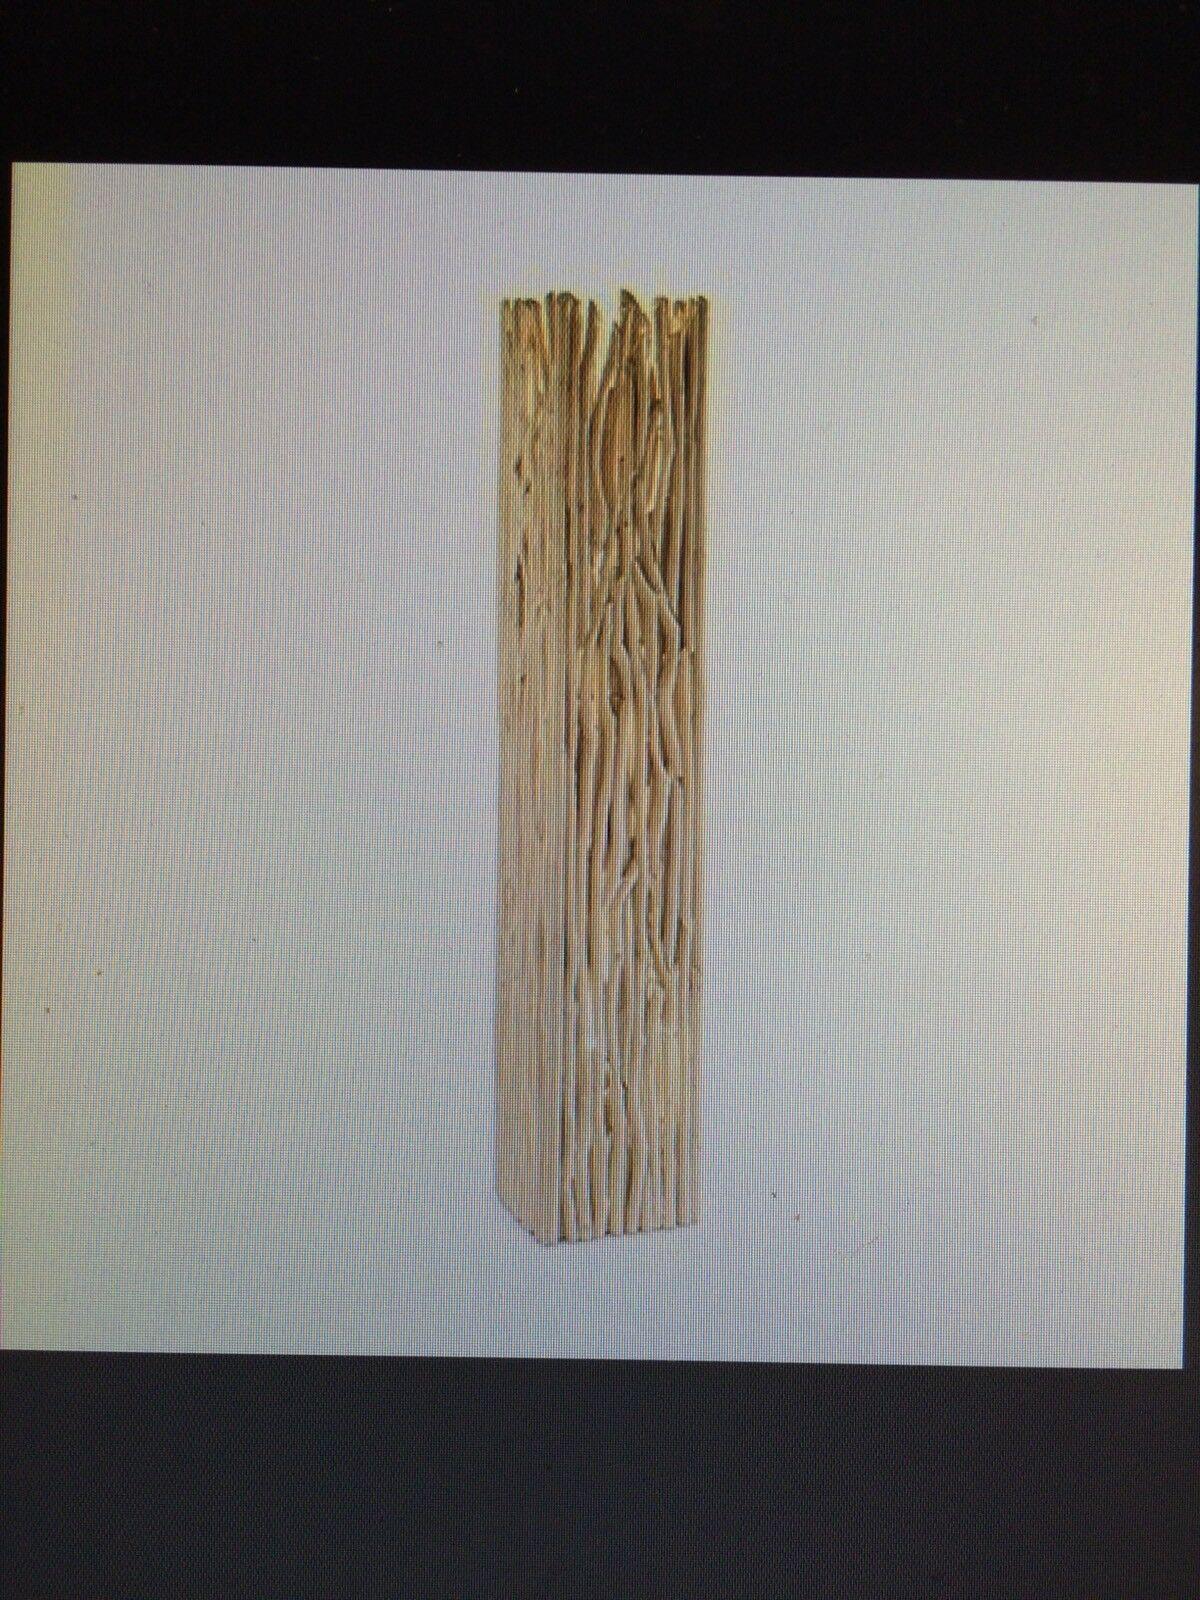 IDEAL-LUX-DRIFTWOOD-PT2-PIANTANA-CON-STRUTTURA-IN-RAMI-DI-LEGNO-NATURALE-2x60W-132924047445